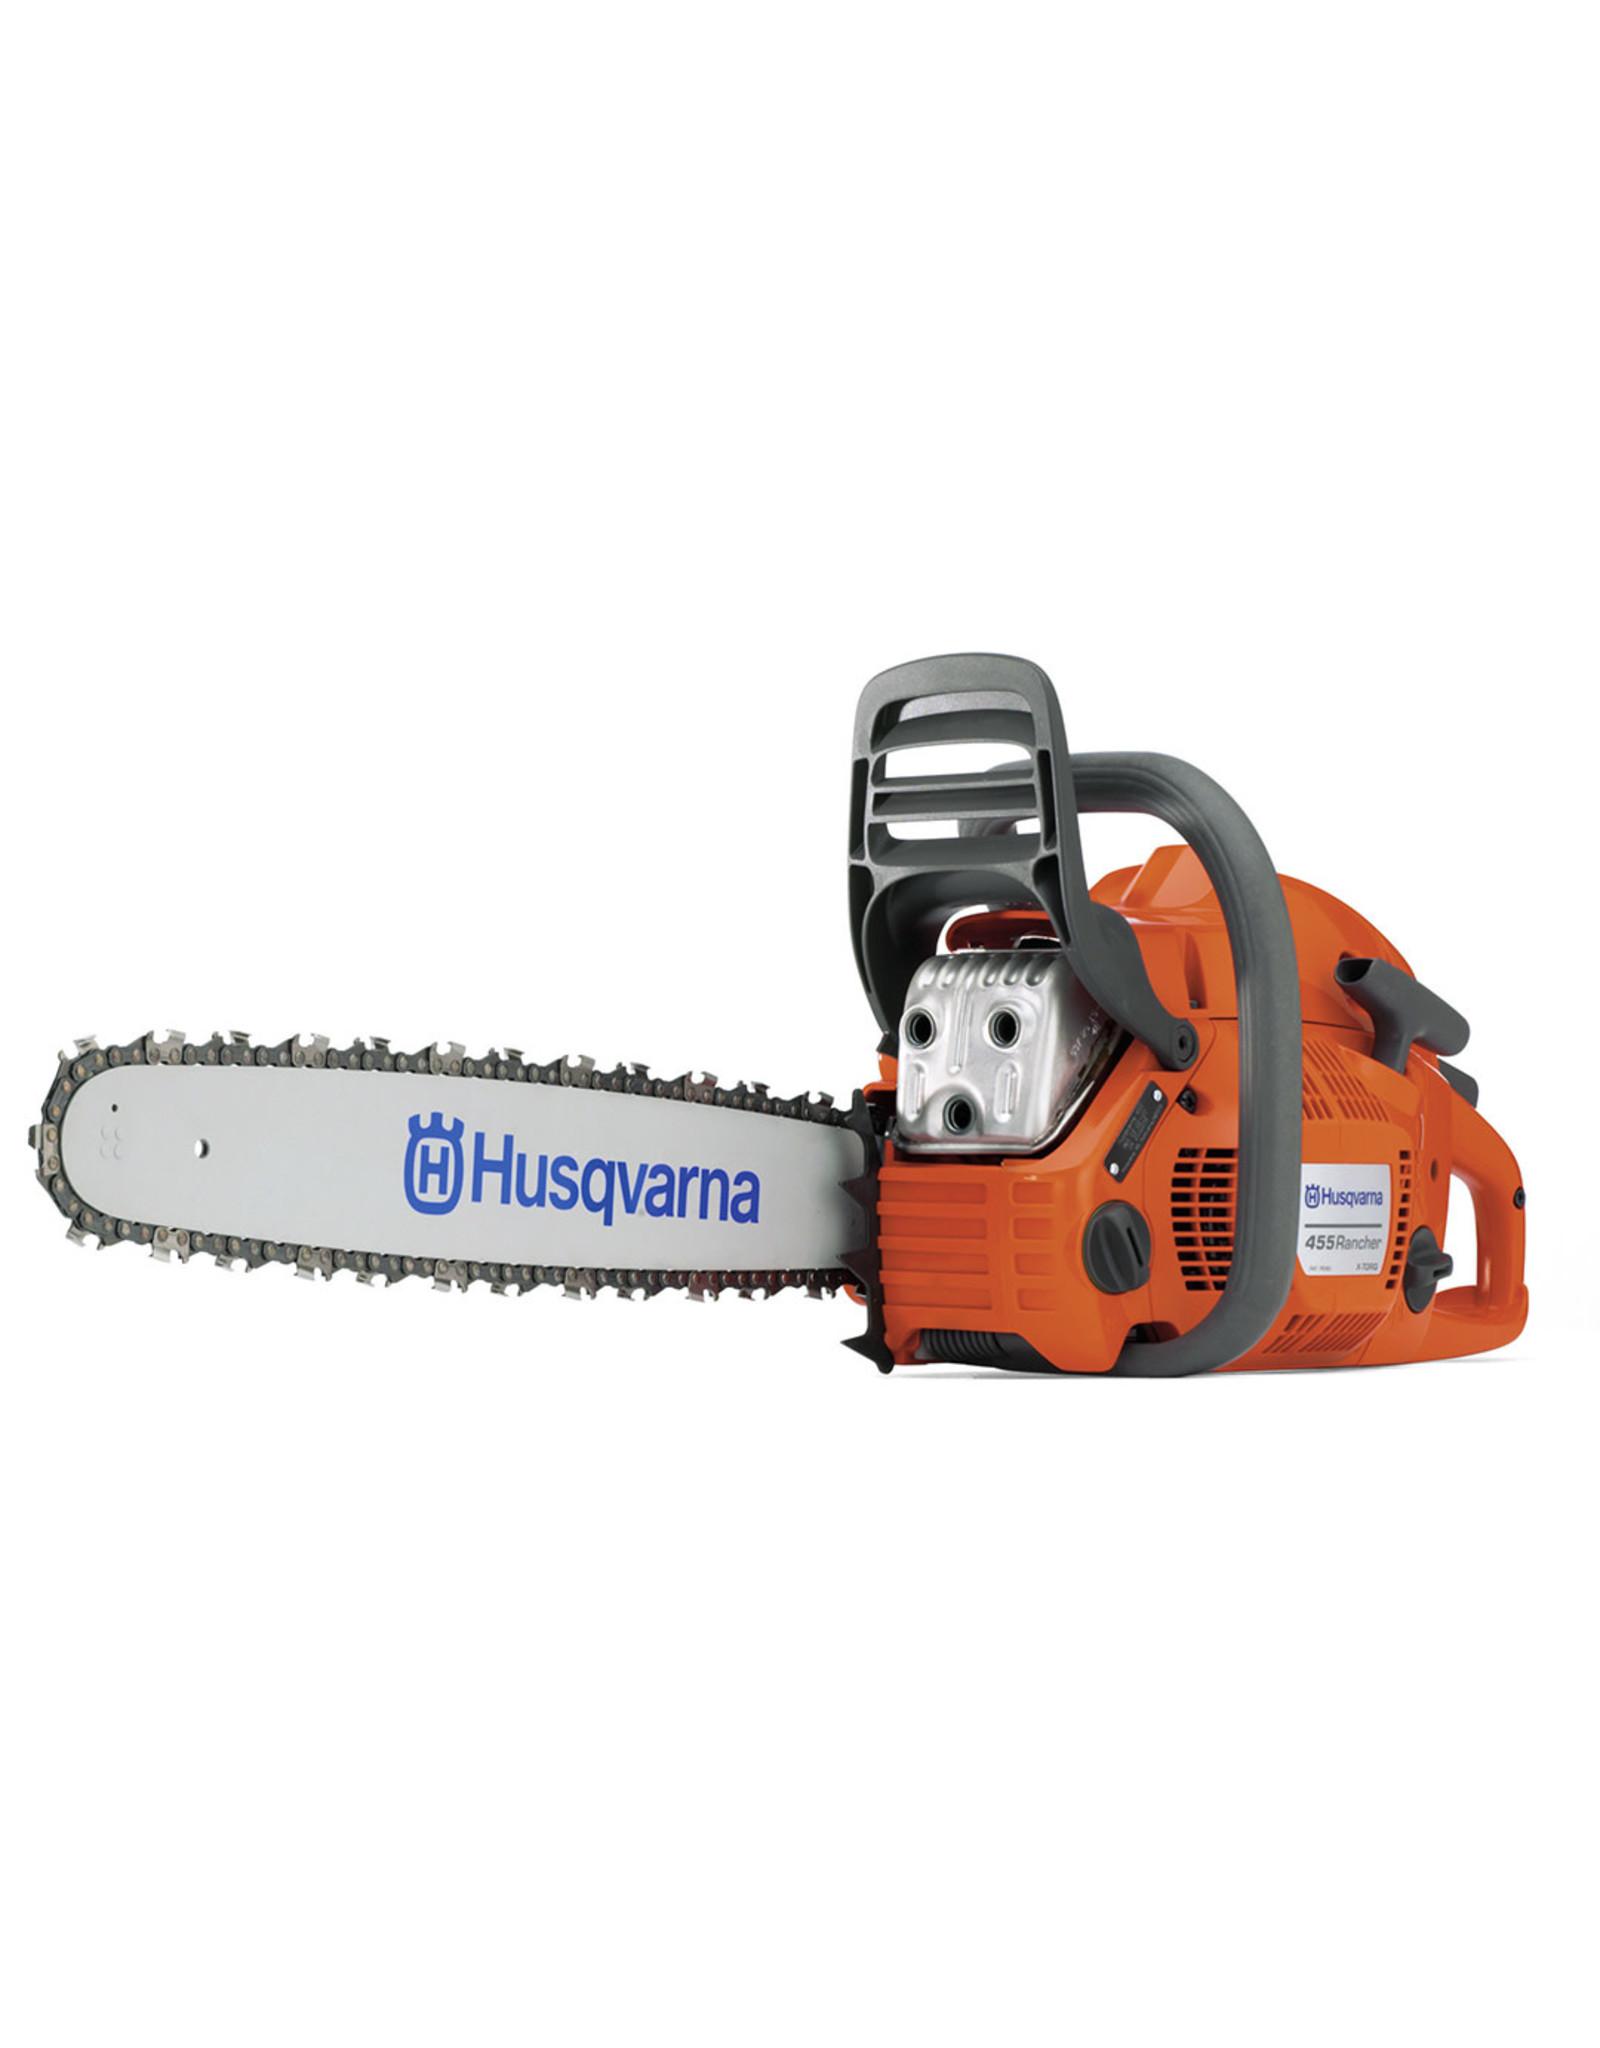 "Husqvarna 455 RANCHER 20"", 3/8 pitch, .050 ga. 55.5cc Rancher chainsaw, assembled"